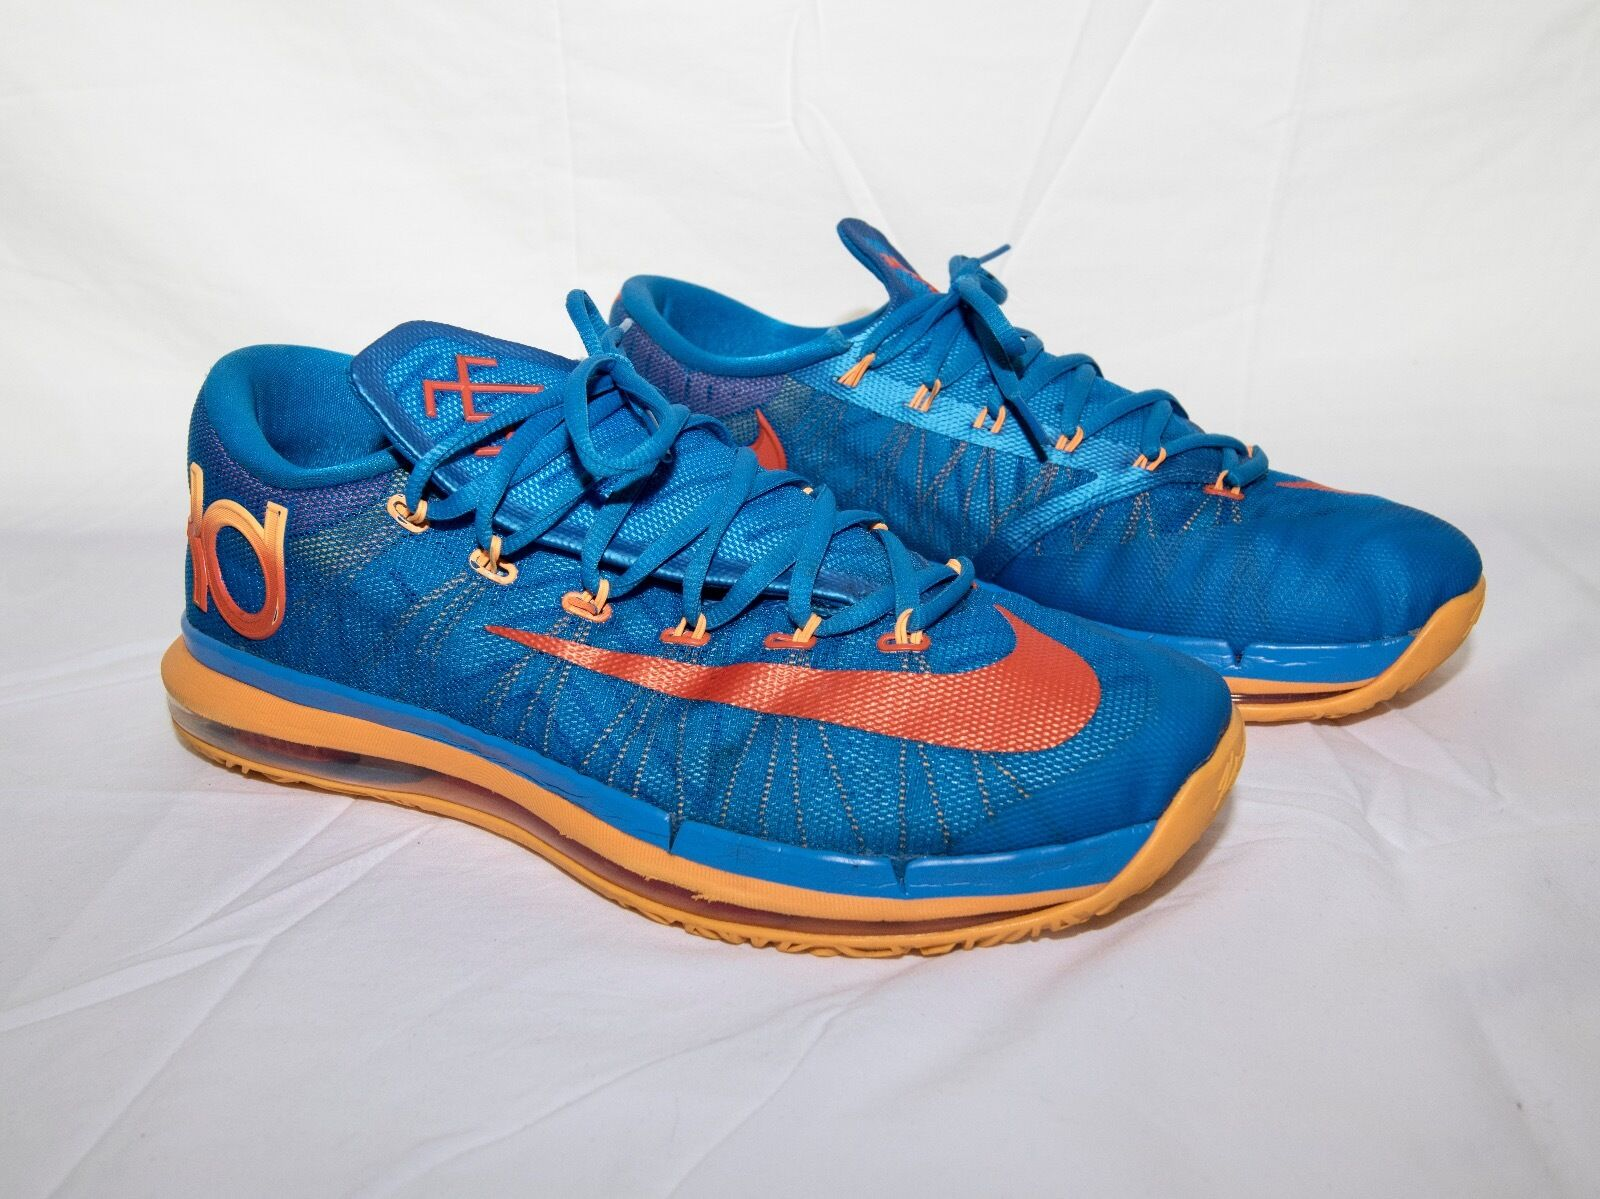 Nike zoom kd vii 7 elite foto blu / atomic orange vivida blu arancione dimensioni